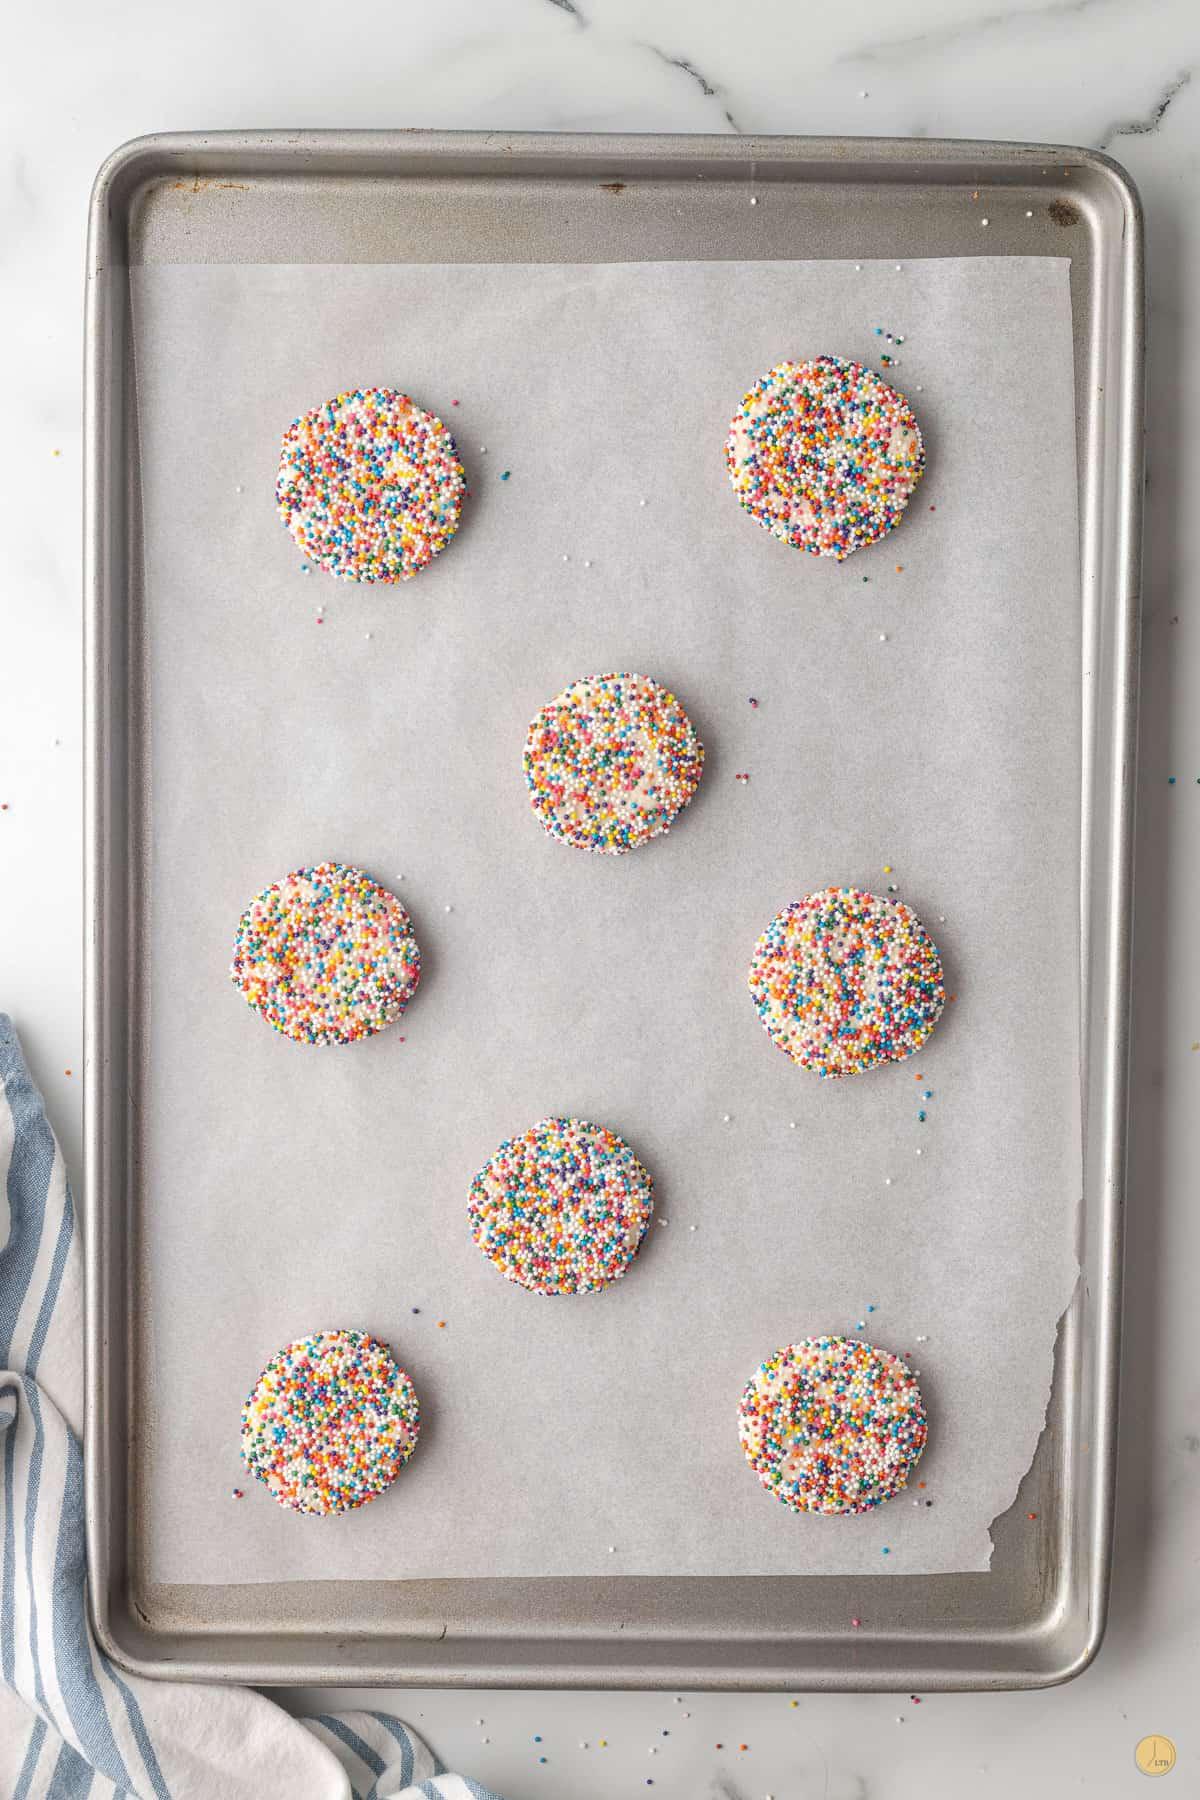 unbaked sprinkle cookies on a baking sheet